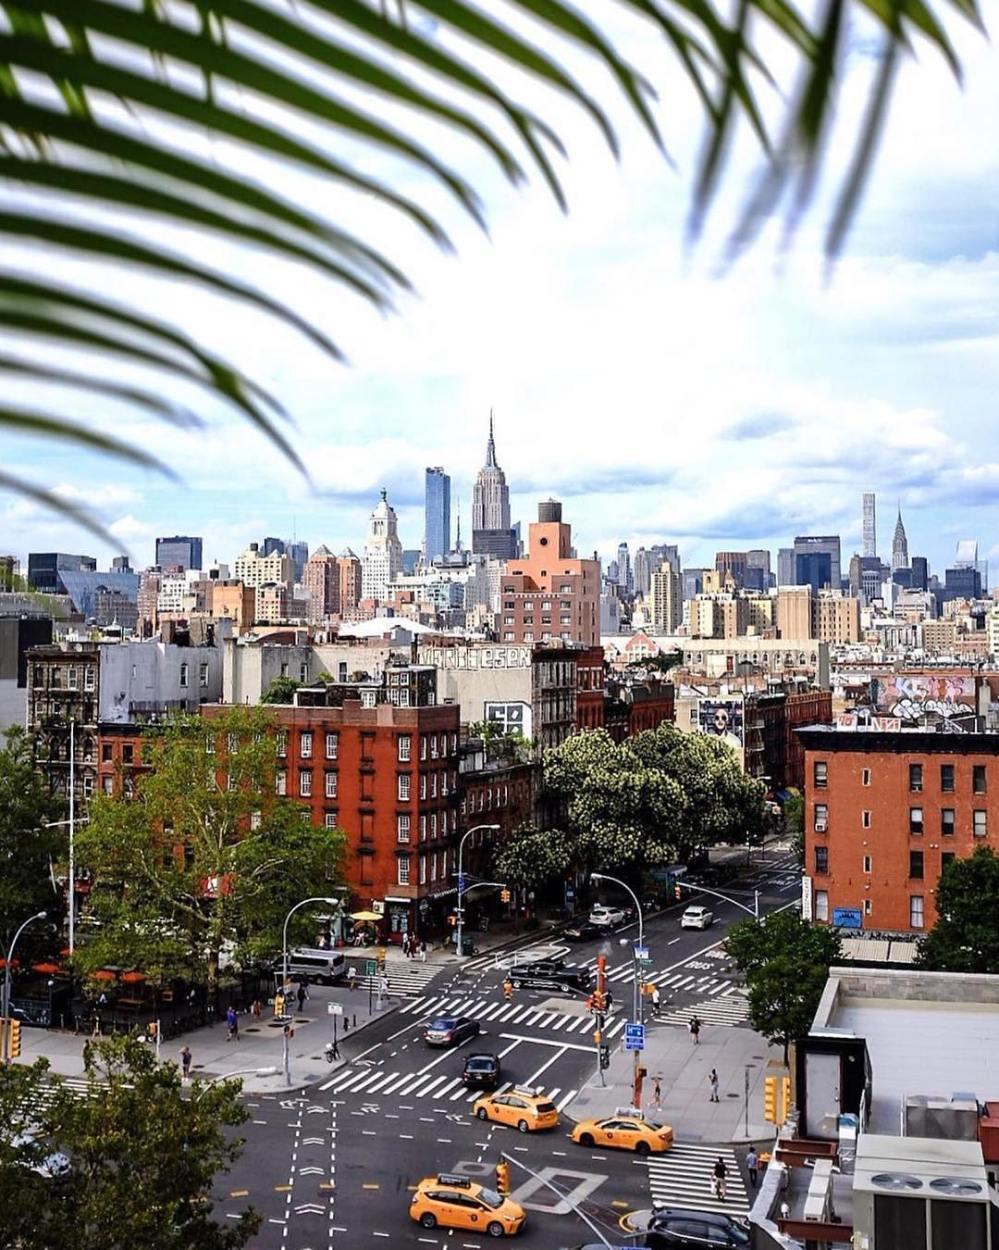 sixtyhotel Lower east side new york.jpg